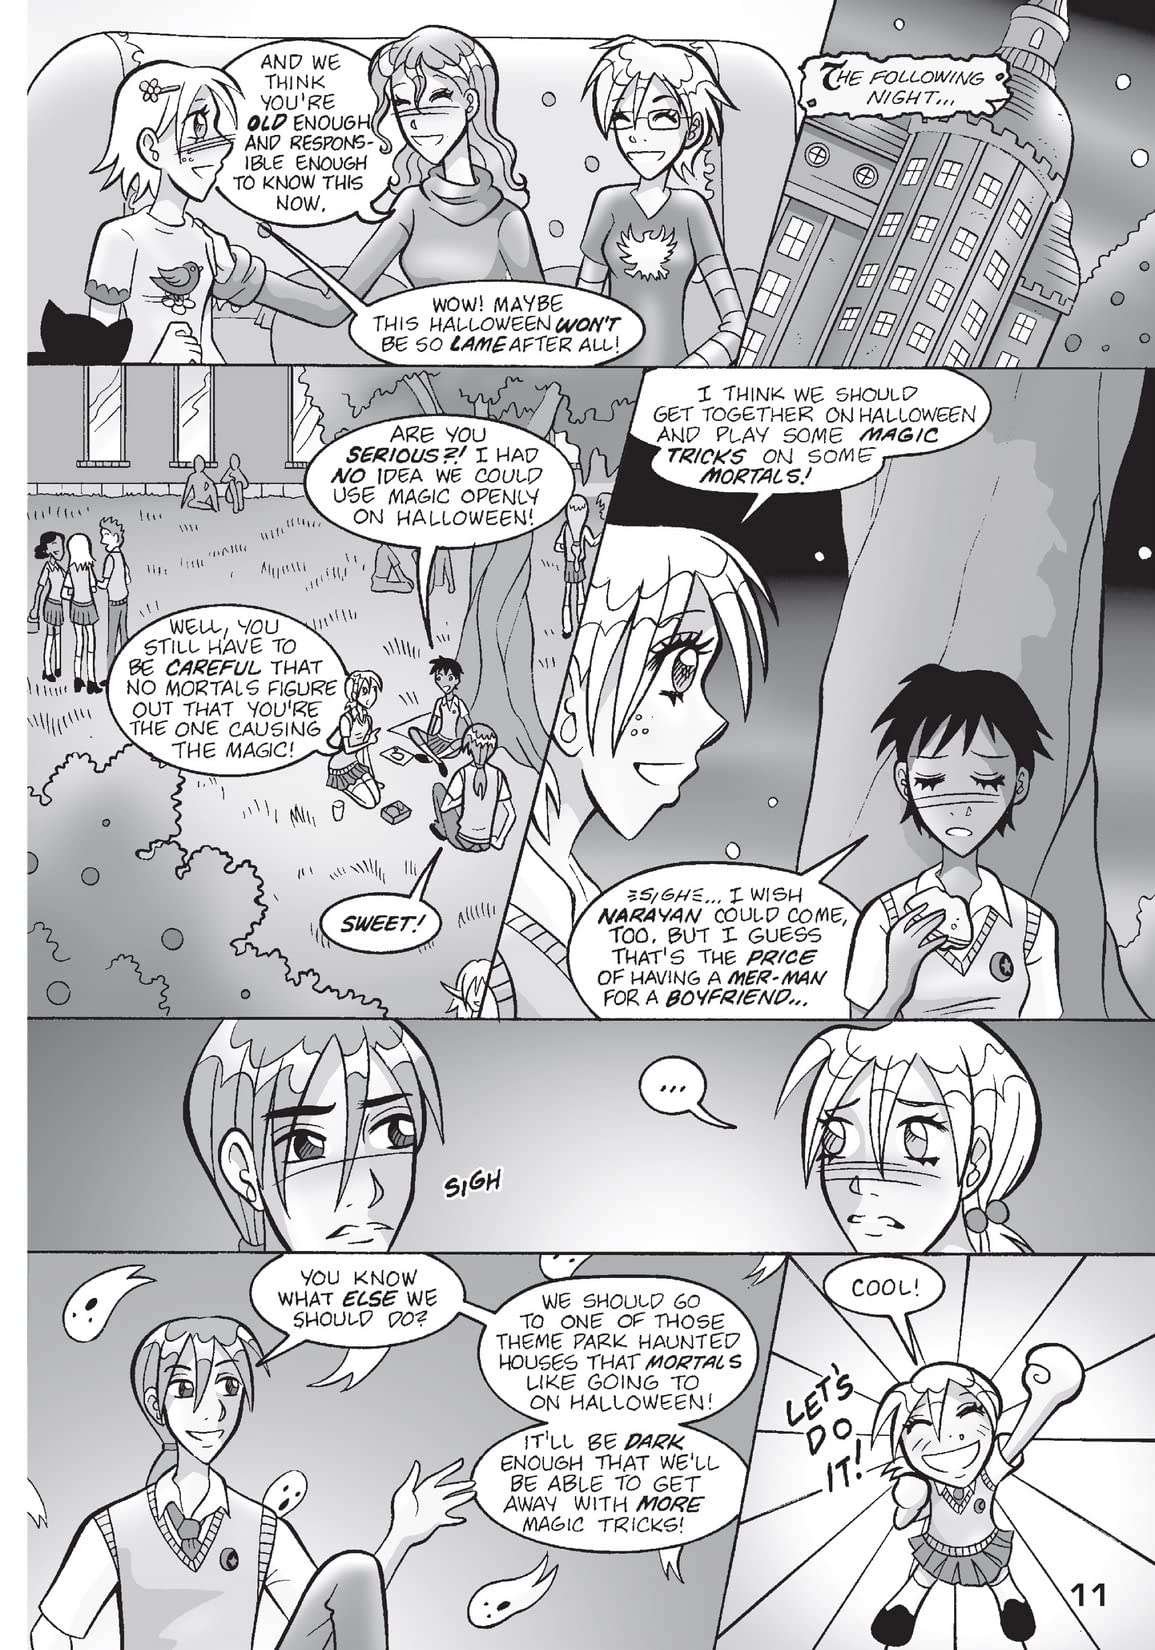 Sabrina Manga: The Magic Within Vol. 3